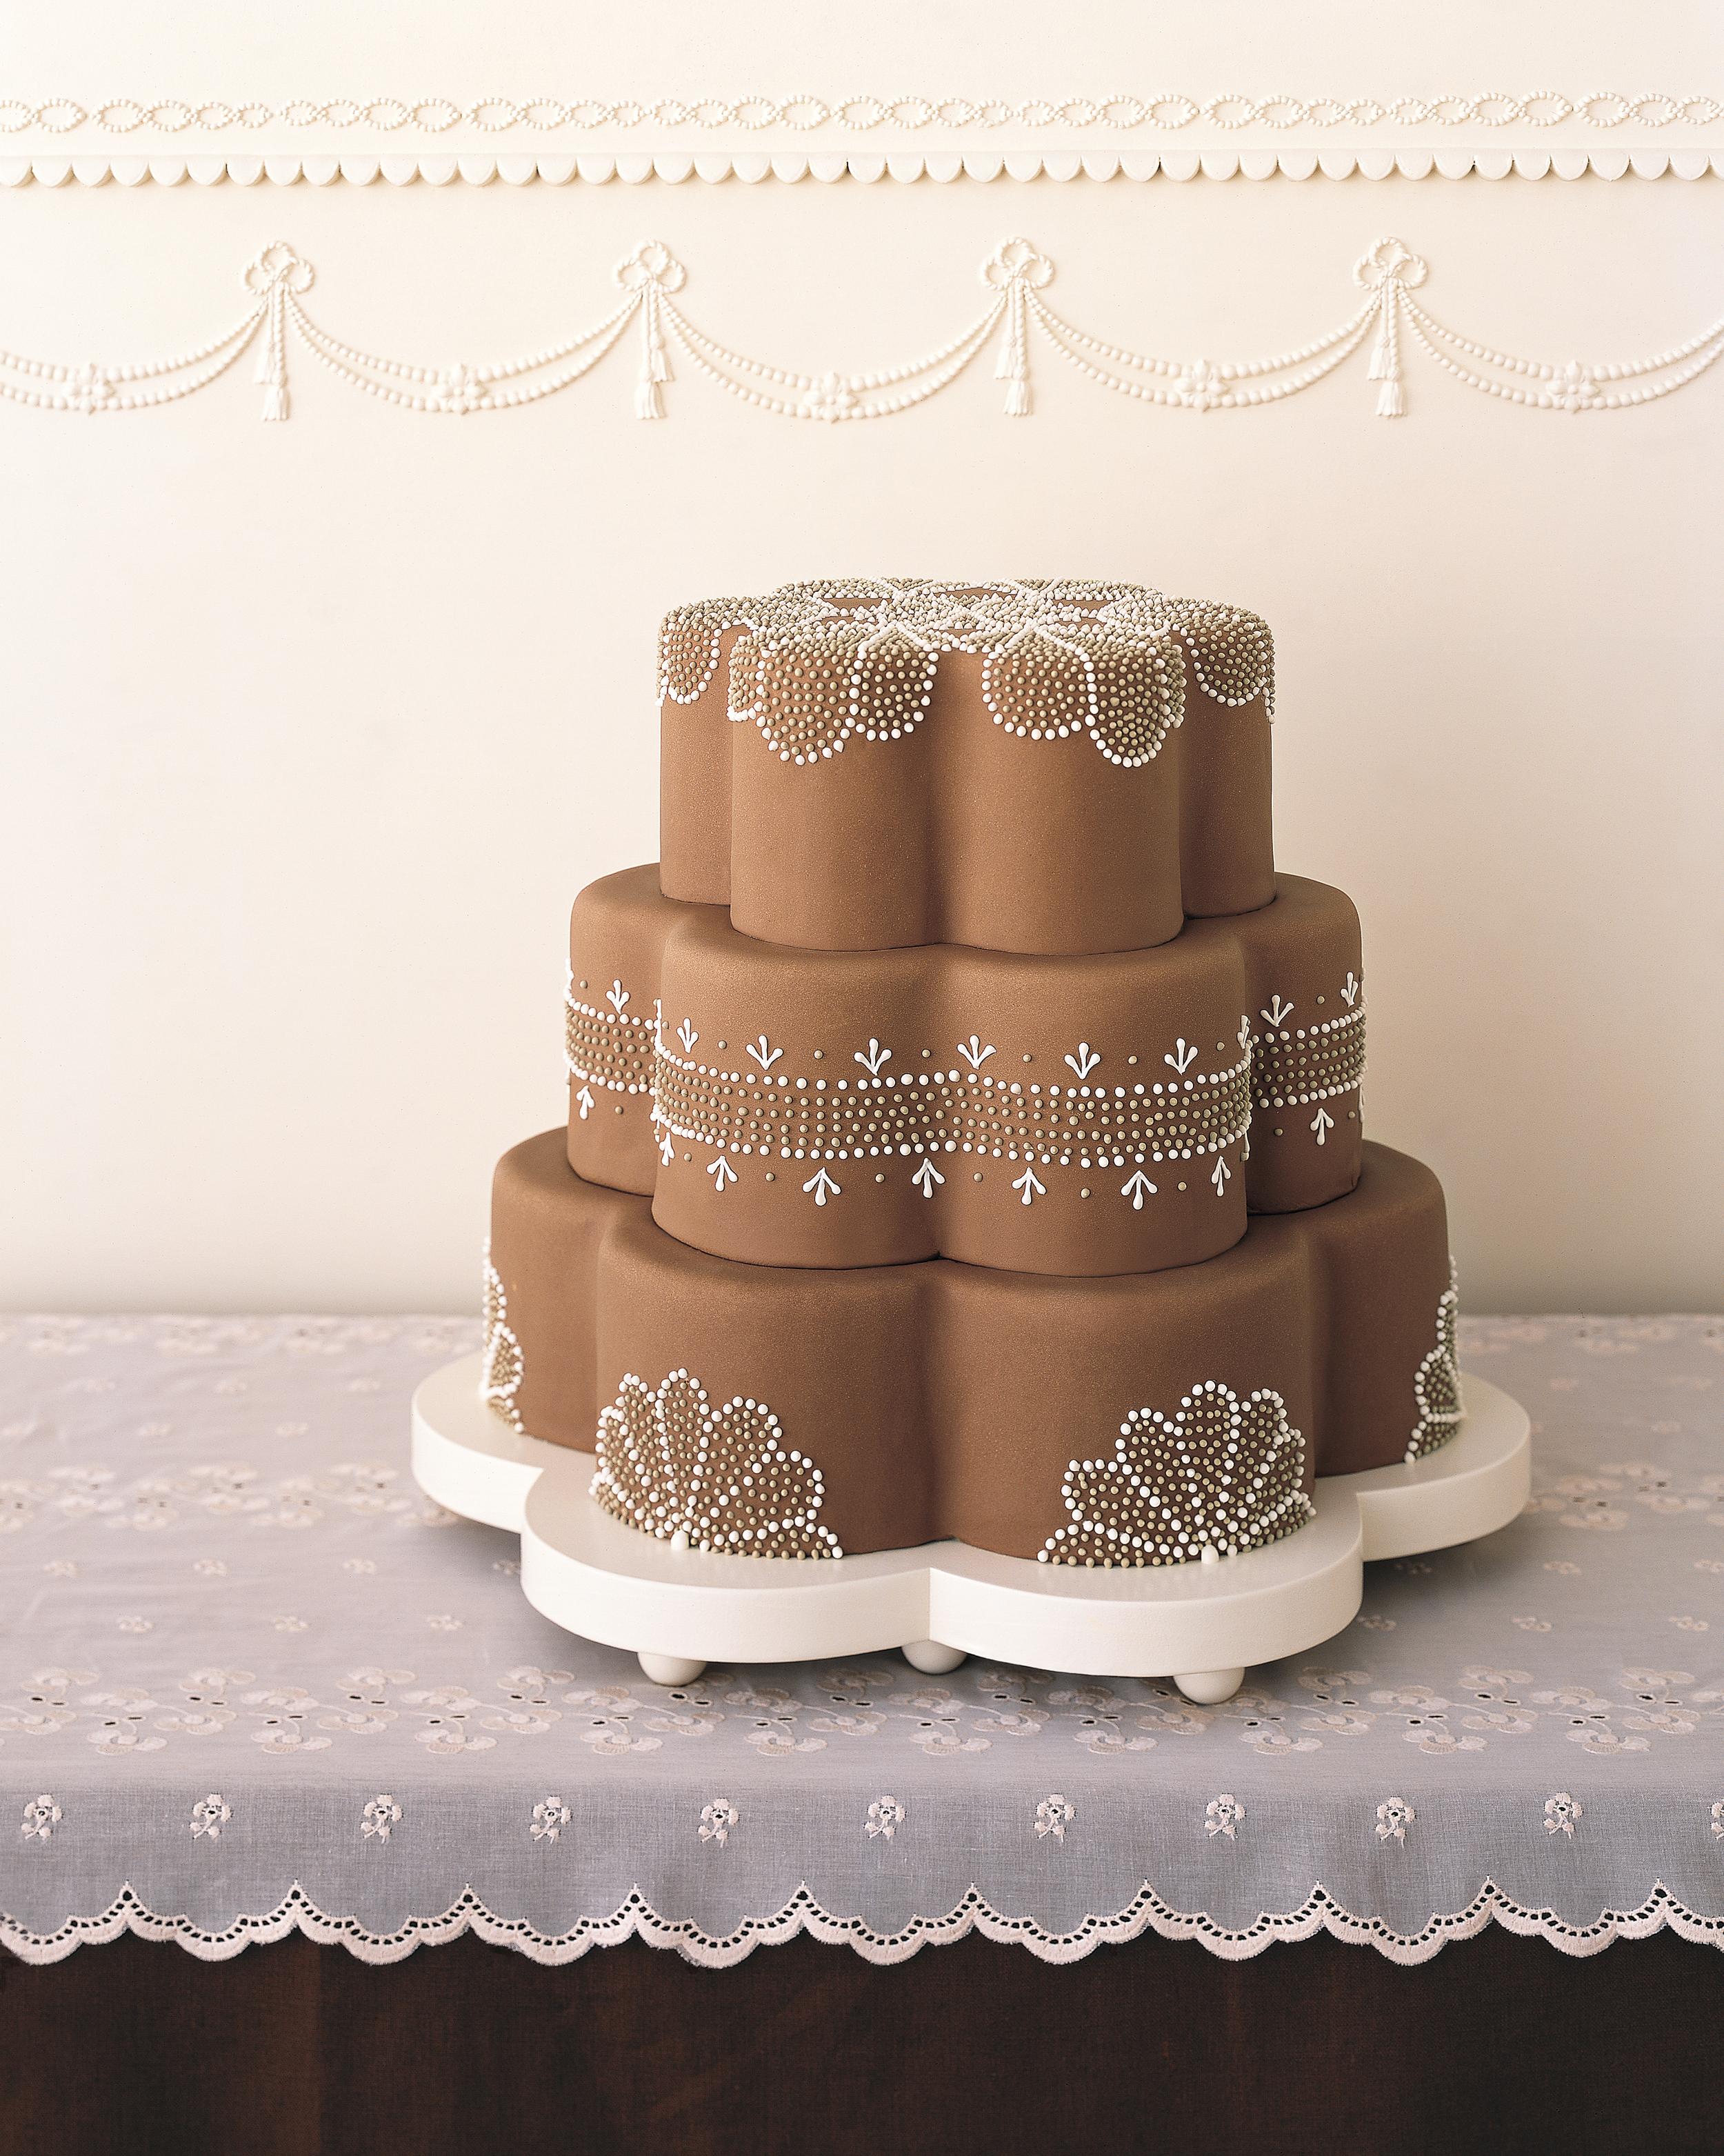 chocolate-cake-ideas-mwa102470_dottie-1114.jpg